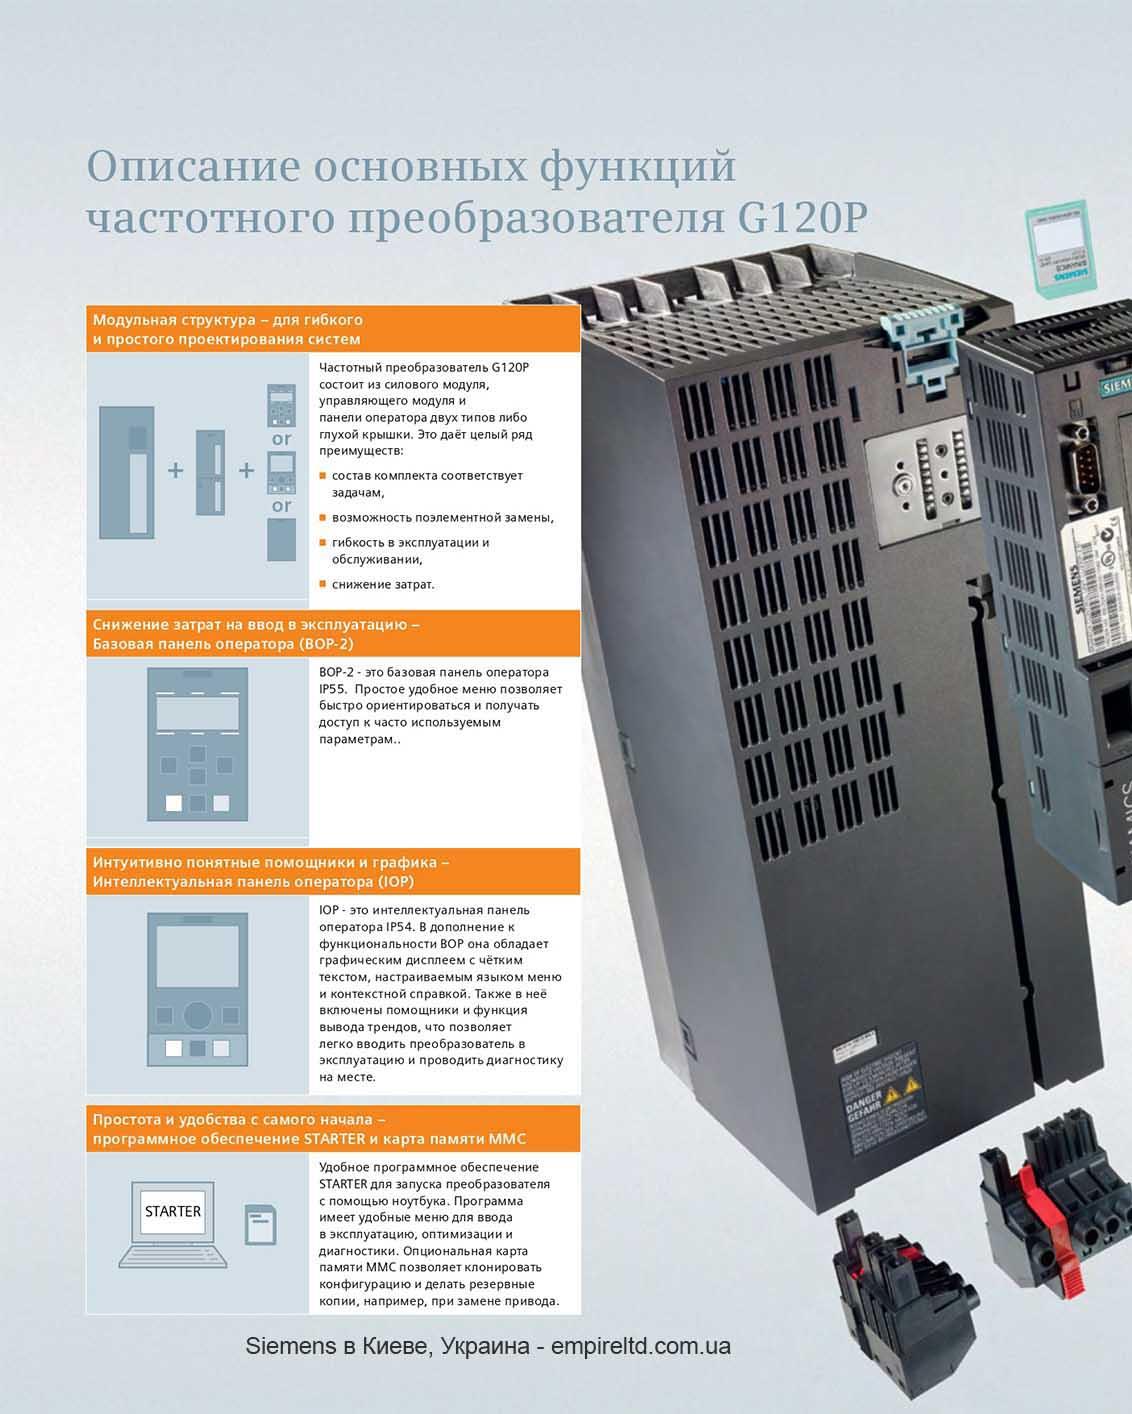 siemens-kiev-ukraine-0025-1